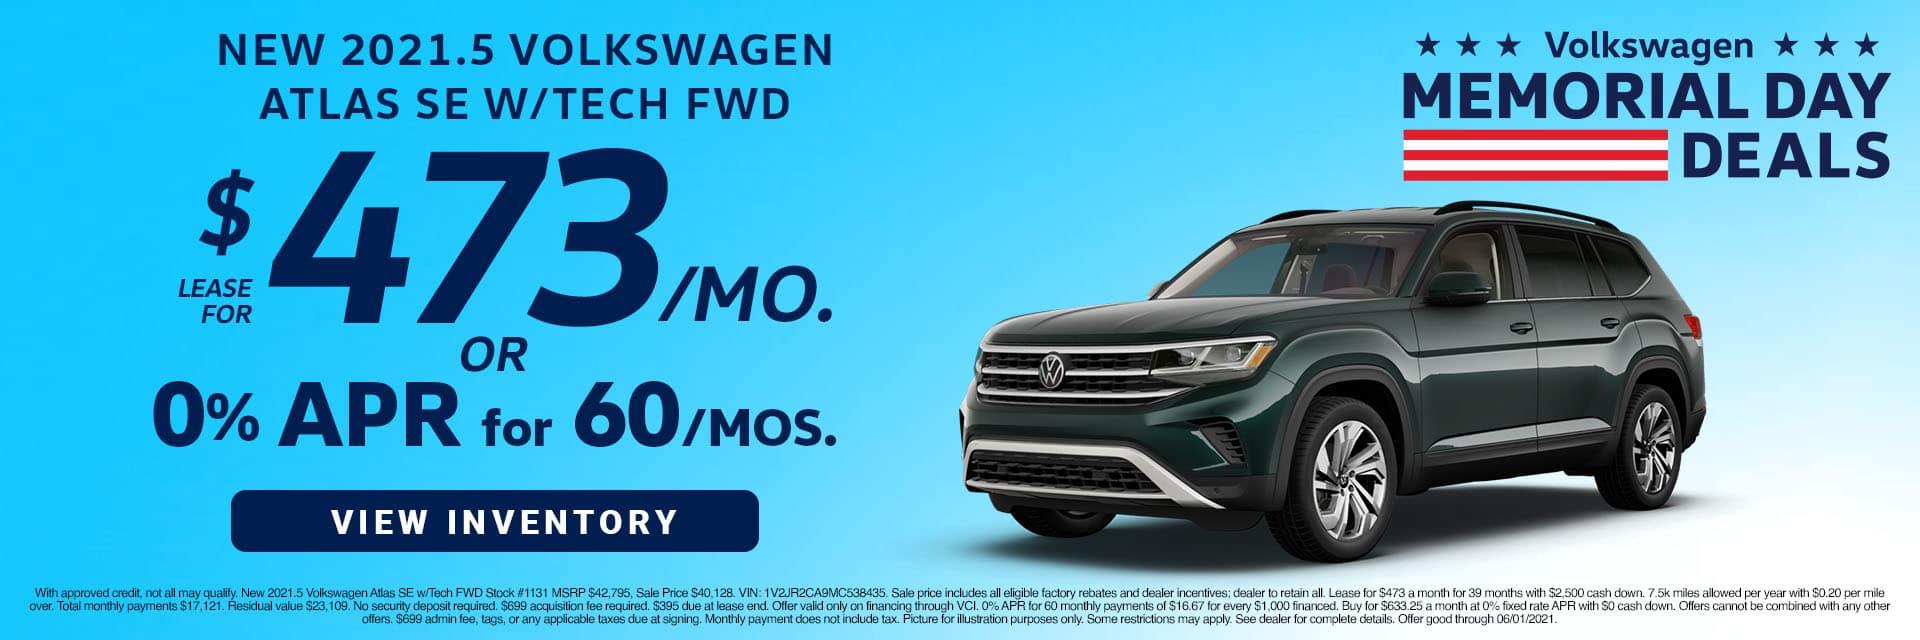 CVWG-May 20212021 Volkswagen Atlas